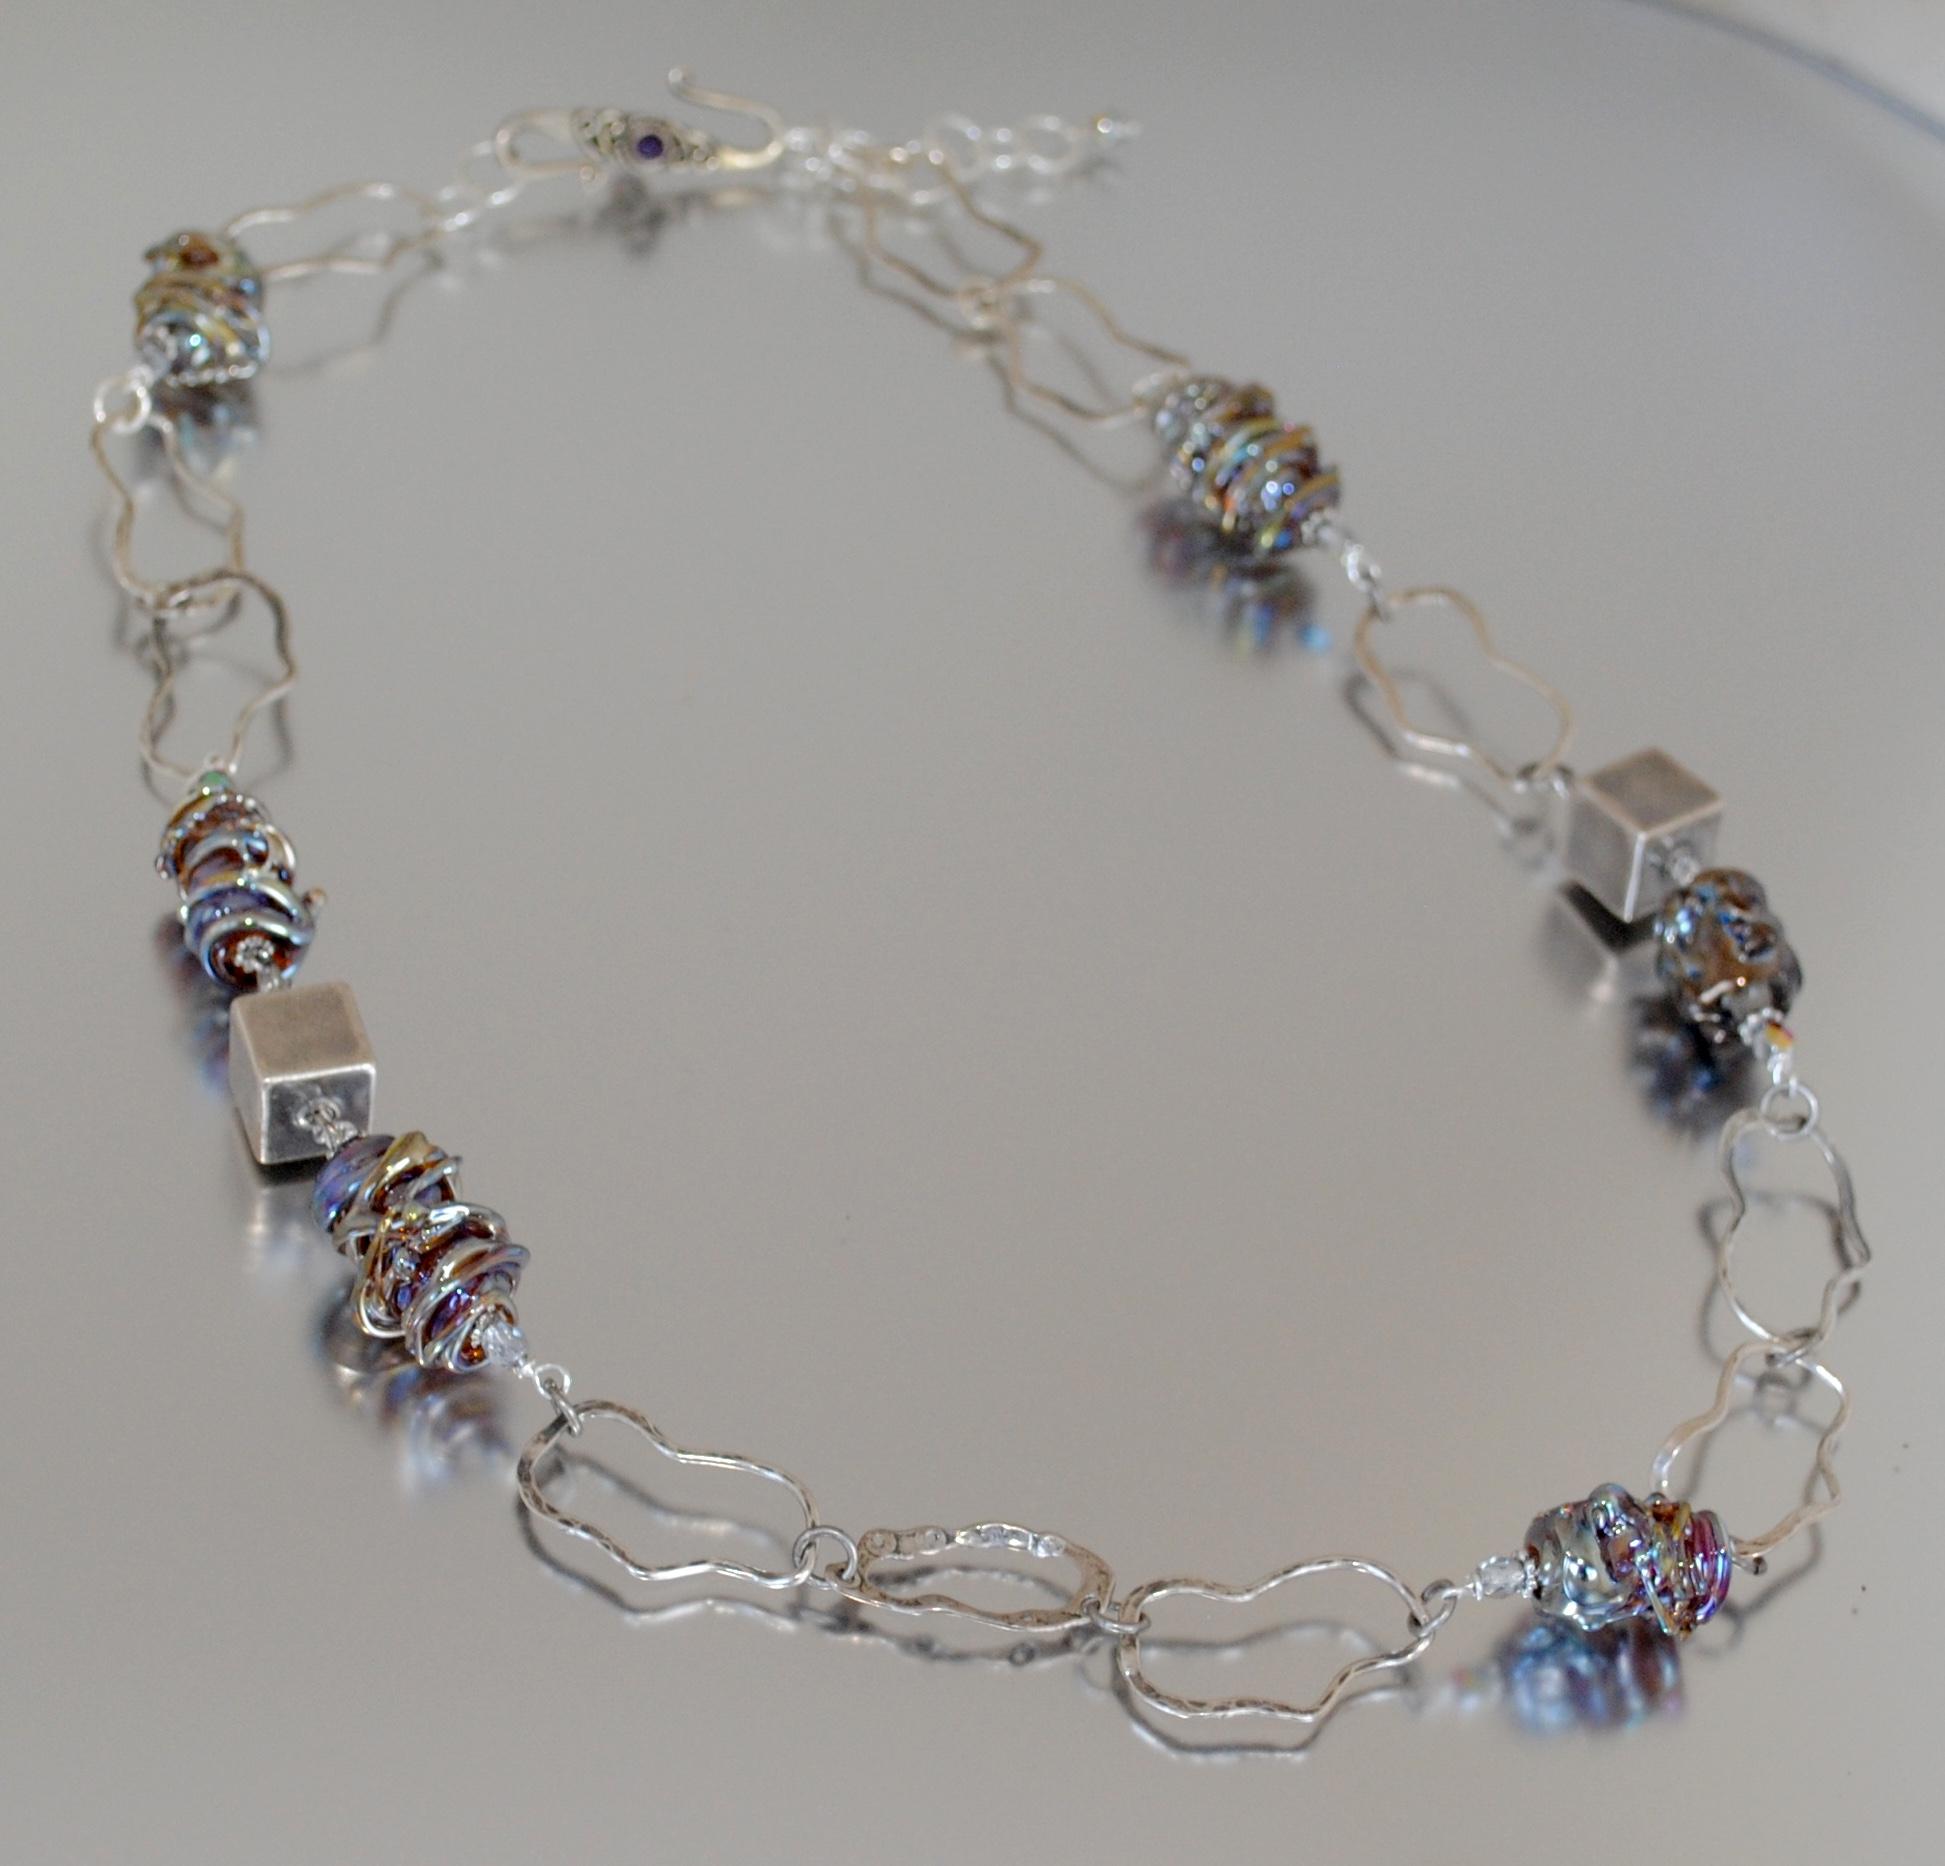 Aurae Handmade Glass Bead Necklace